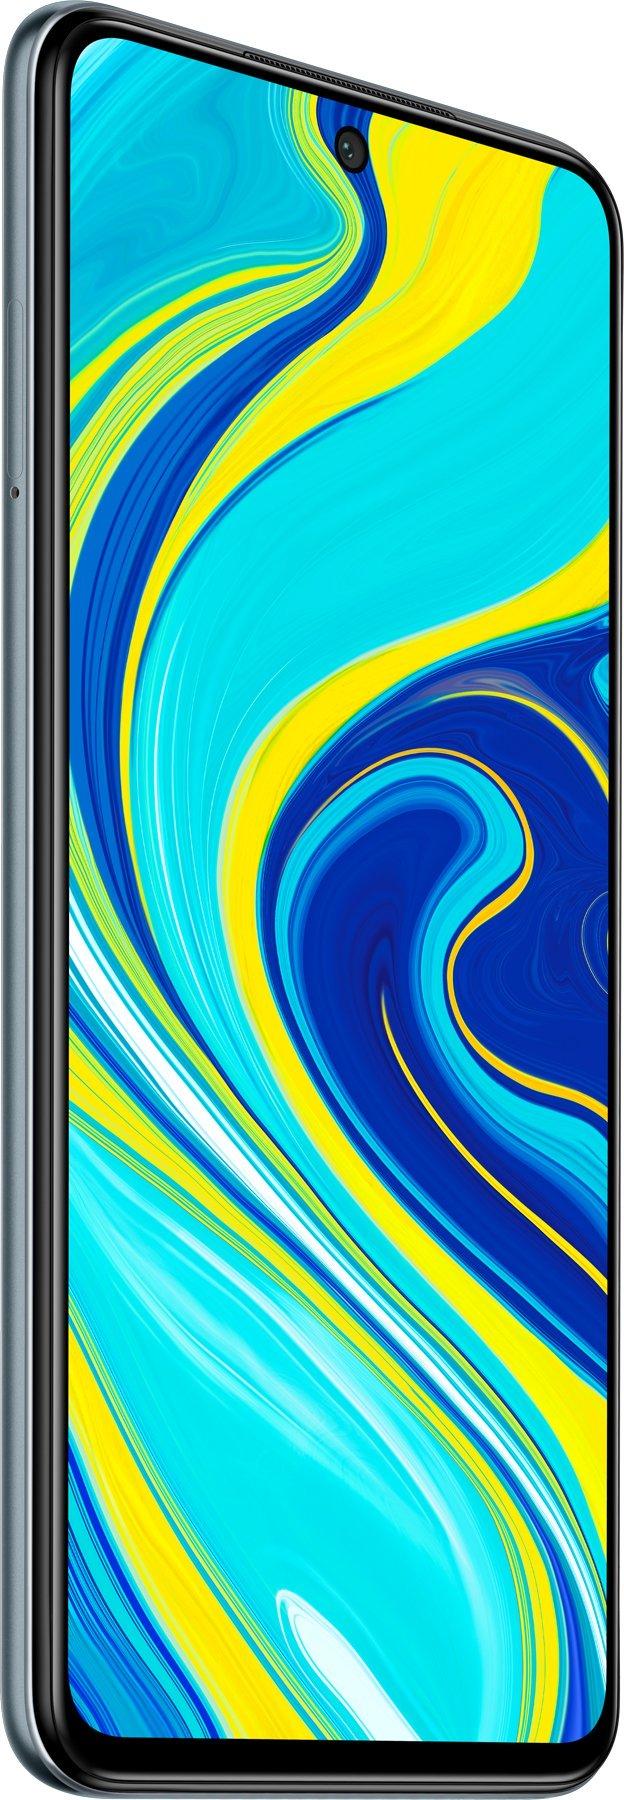 Xiaomi Redmi Note 9S 6GB/128GB grey - 2